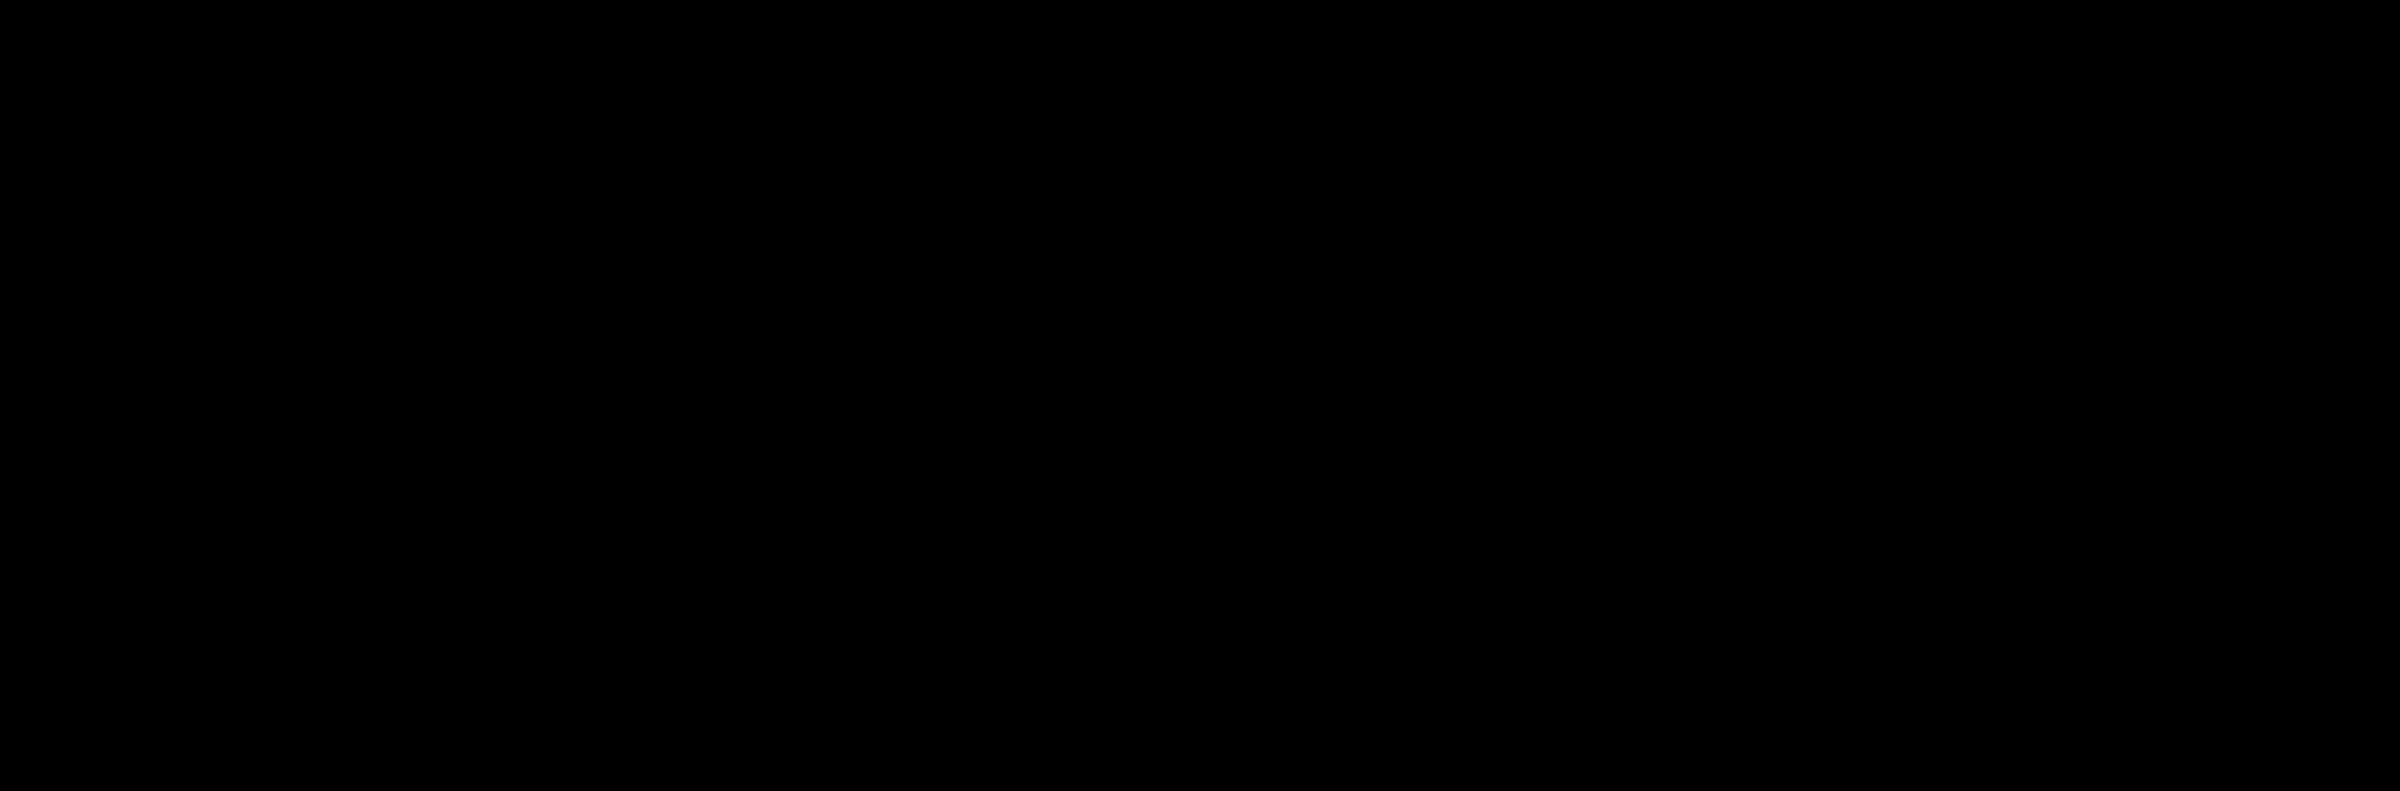 2400x791 Clipart